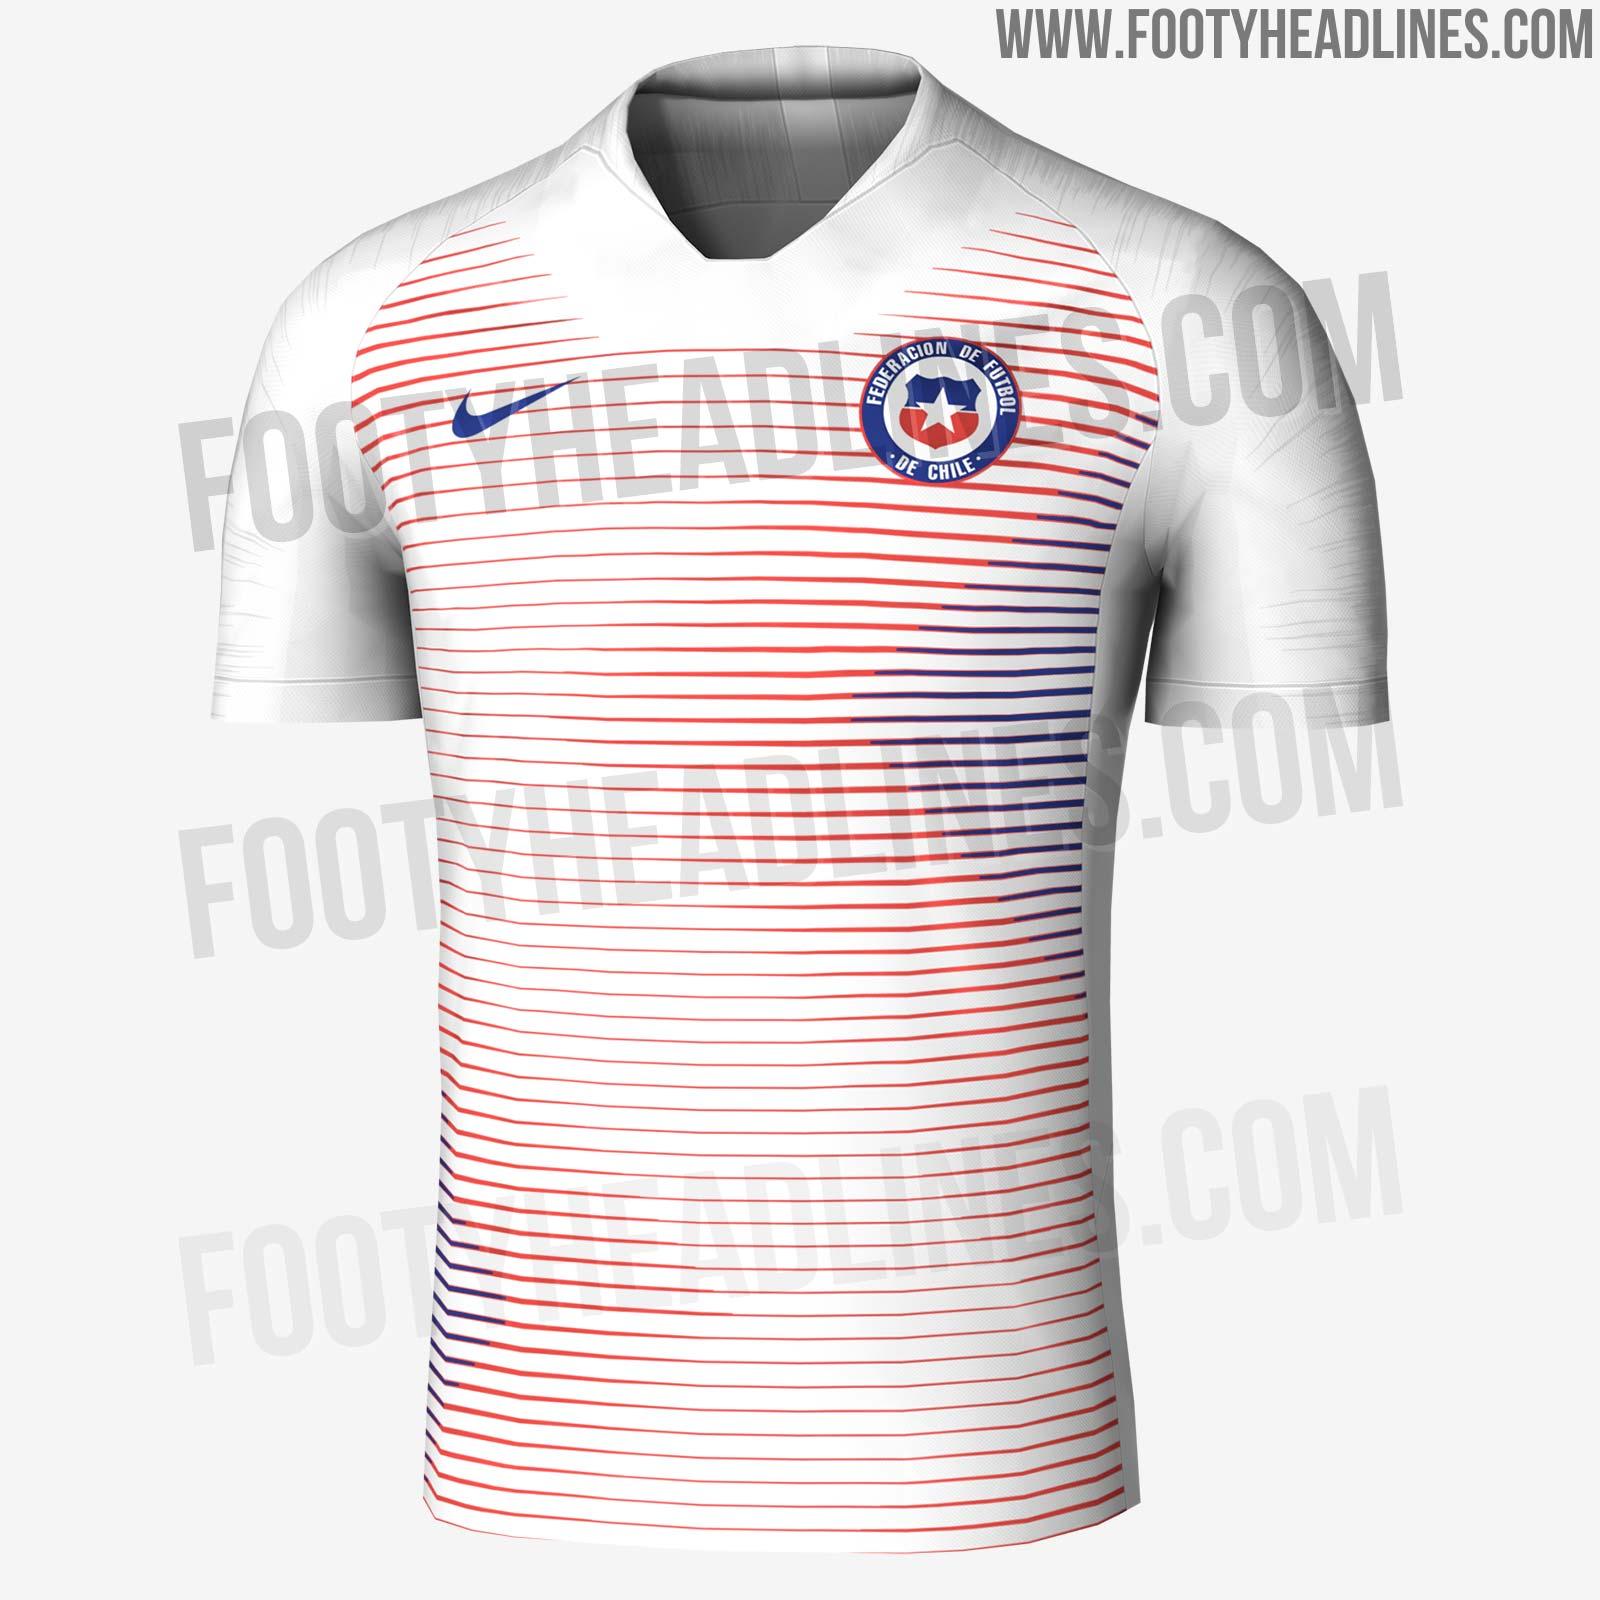 681c03e55 Chile 2018 Away Kit Leaked | Futbolgrid